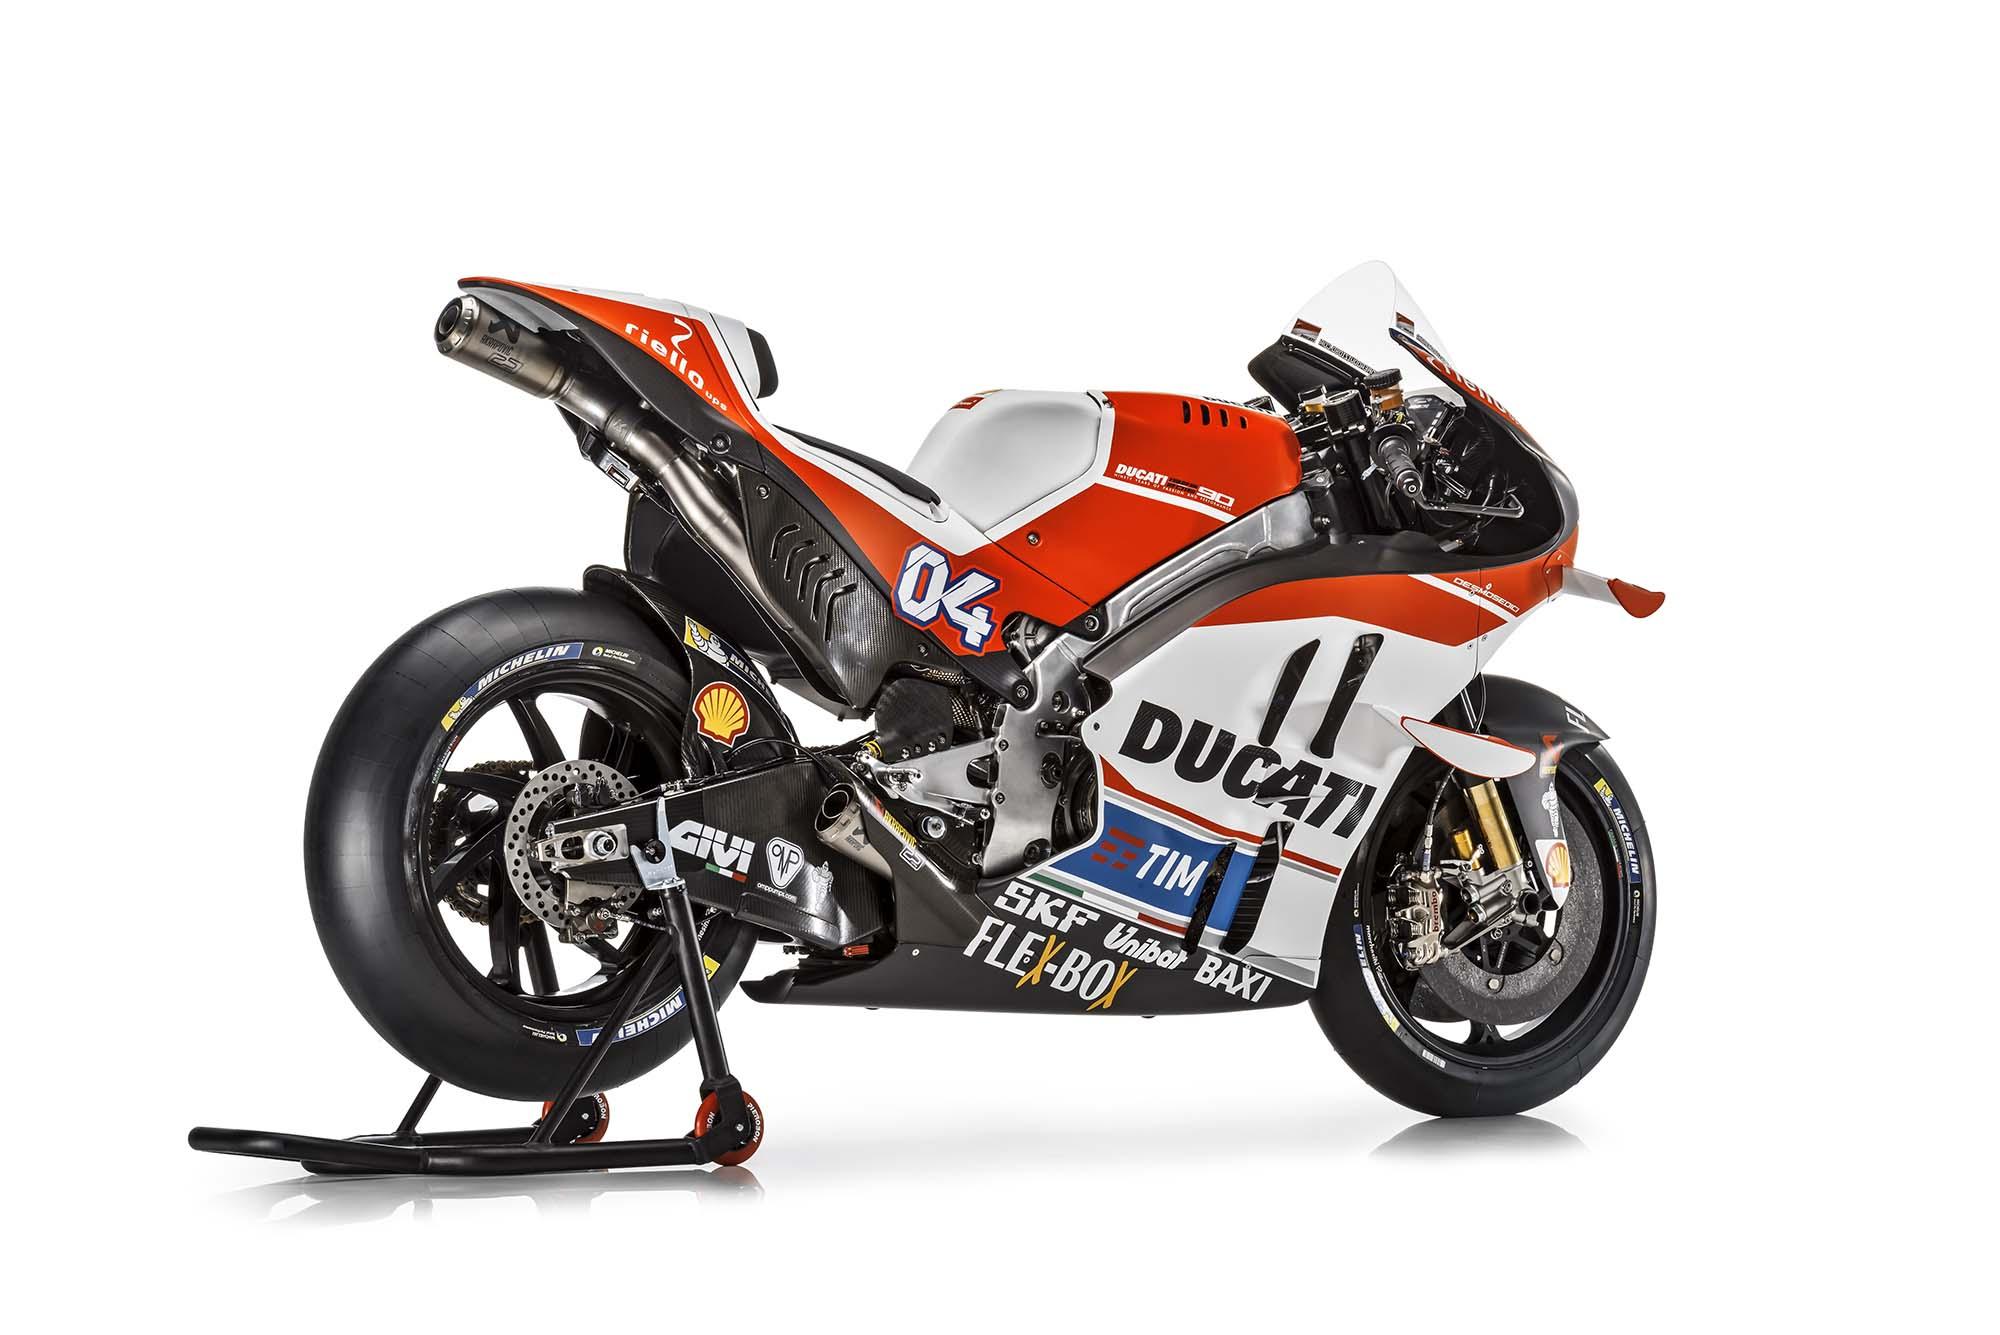 Ducati Jet Exhaust 5